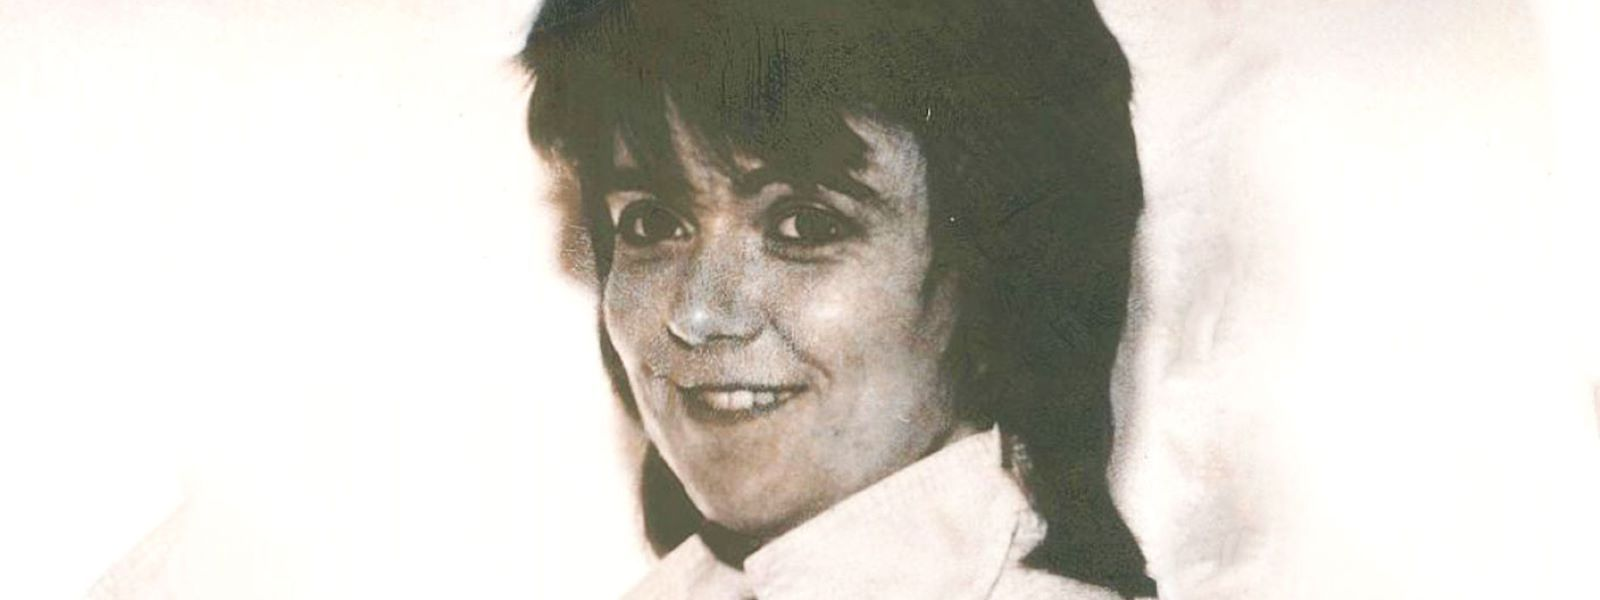 Beatrix Hemmerle wurde 1989 brutal ermordet.